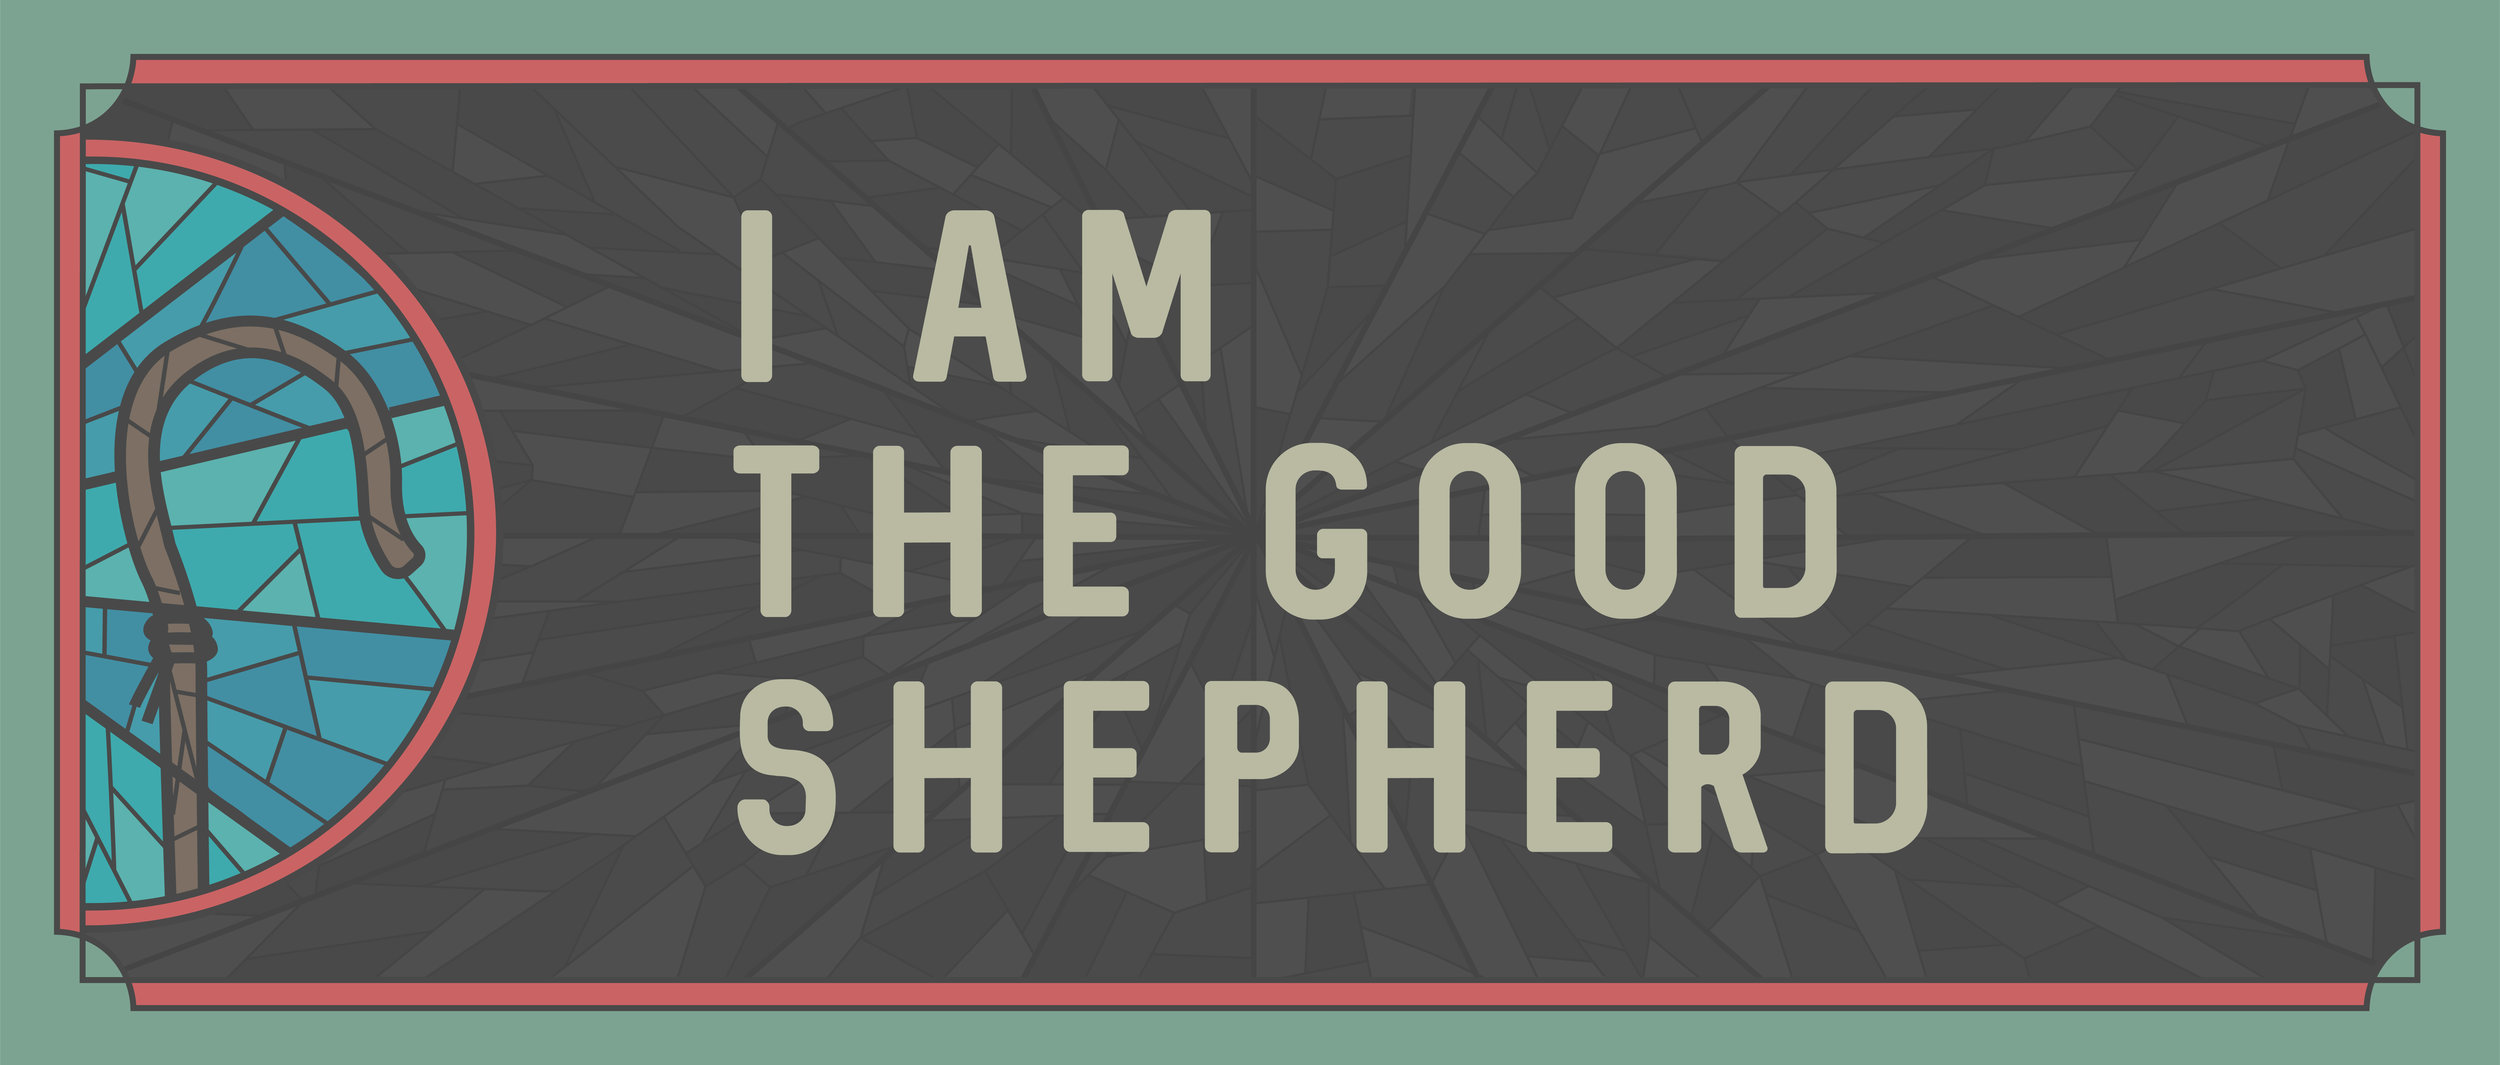 Iam_Shepherd.jpg